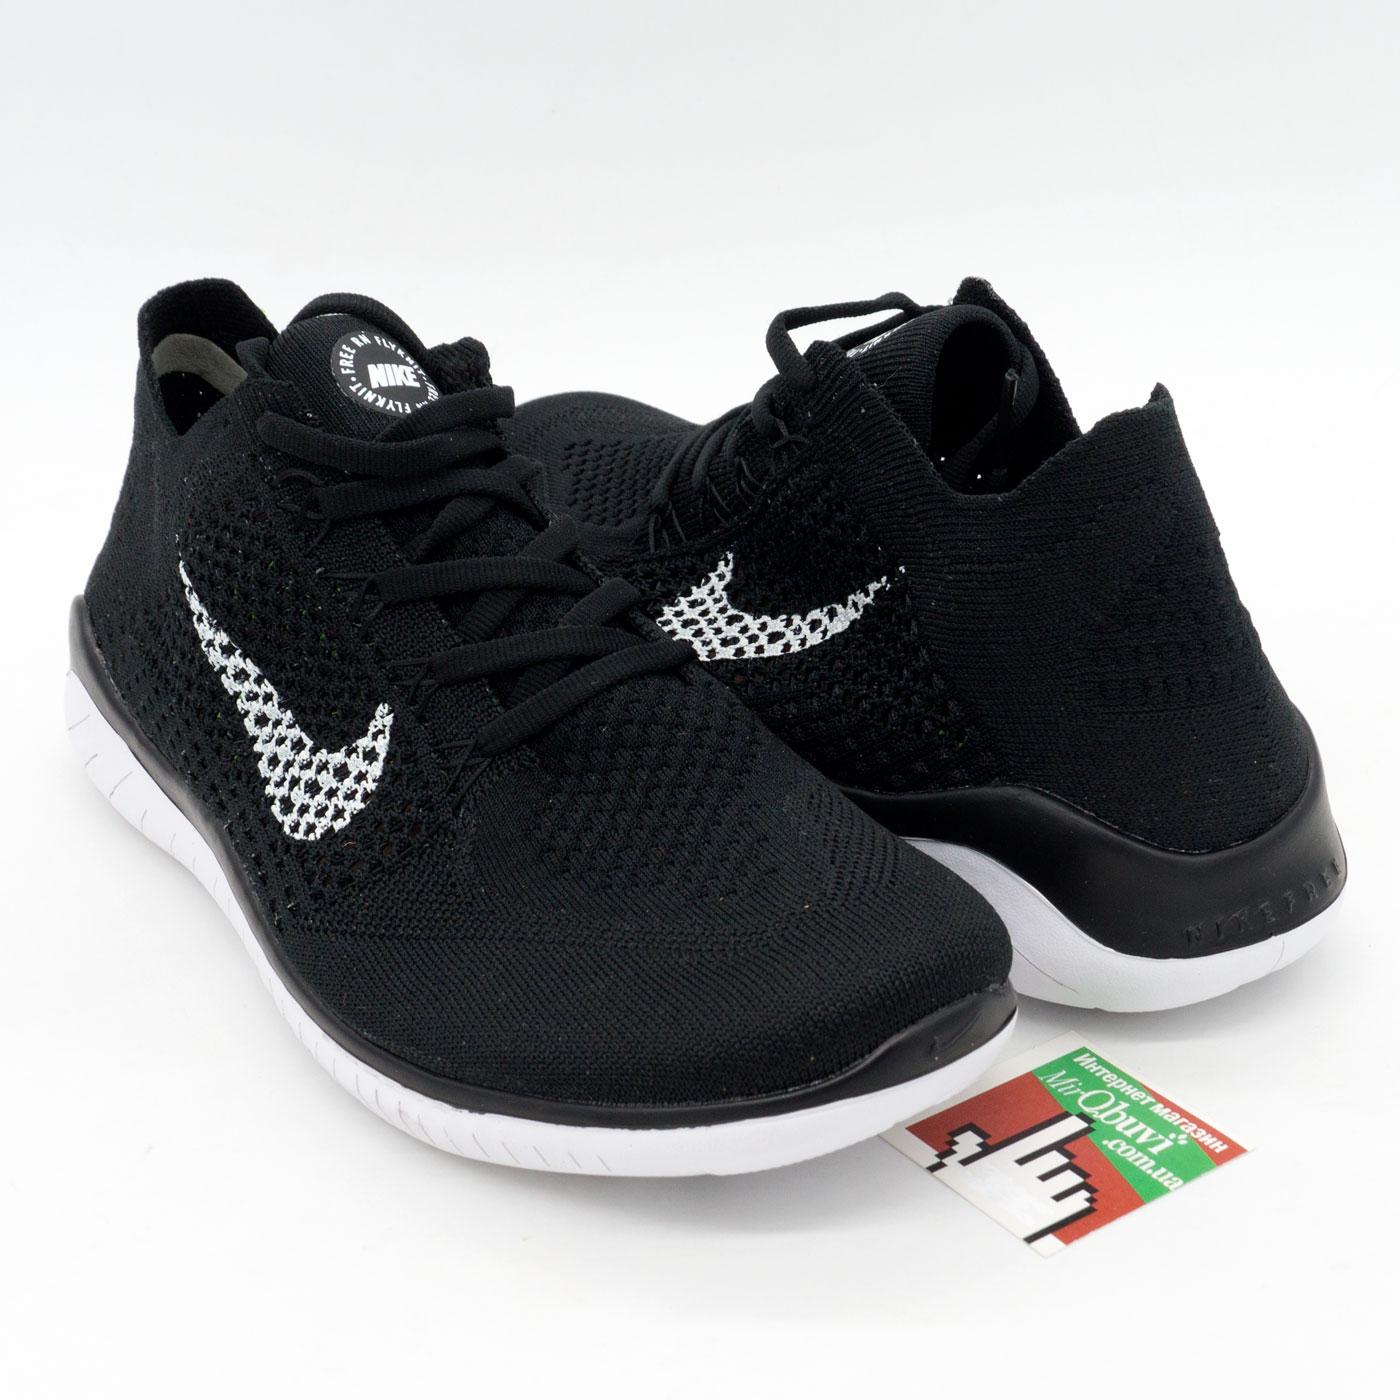 фото front Кроссовки для бега Nike Free Run Flyknit Найк Фри Ран, черно-белые front